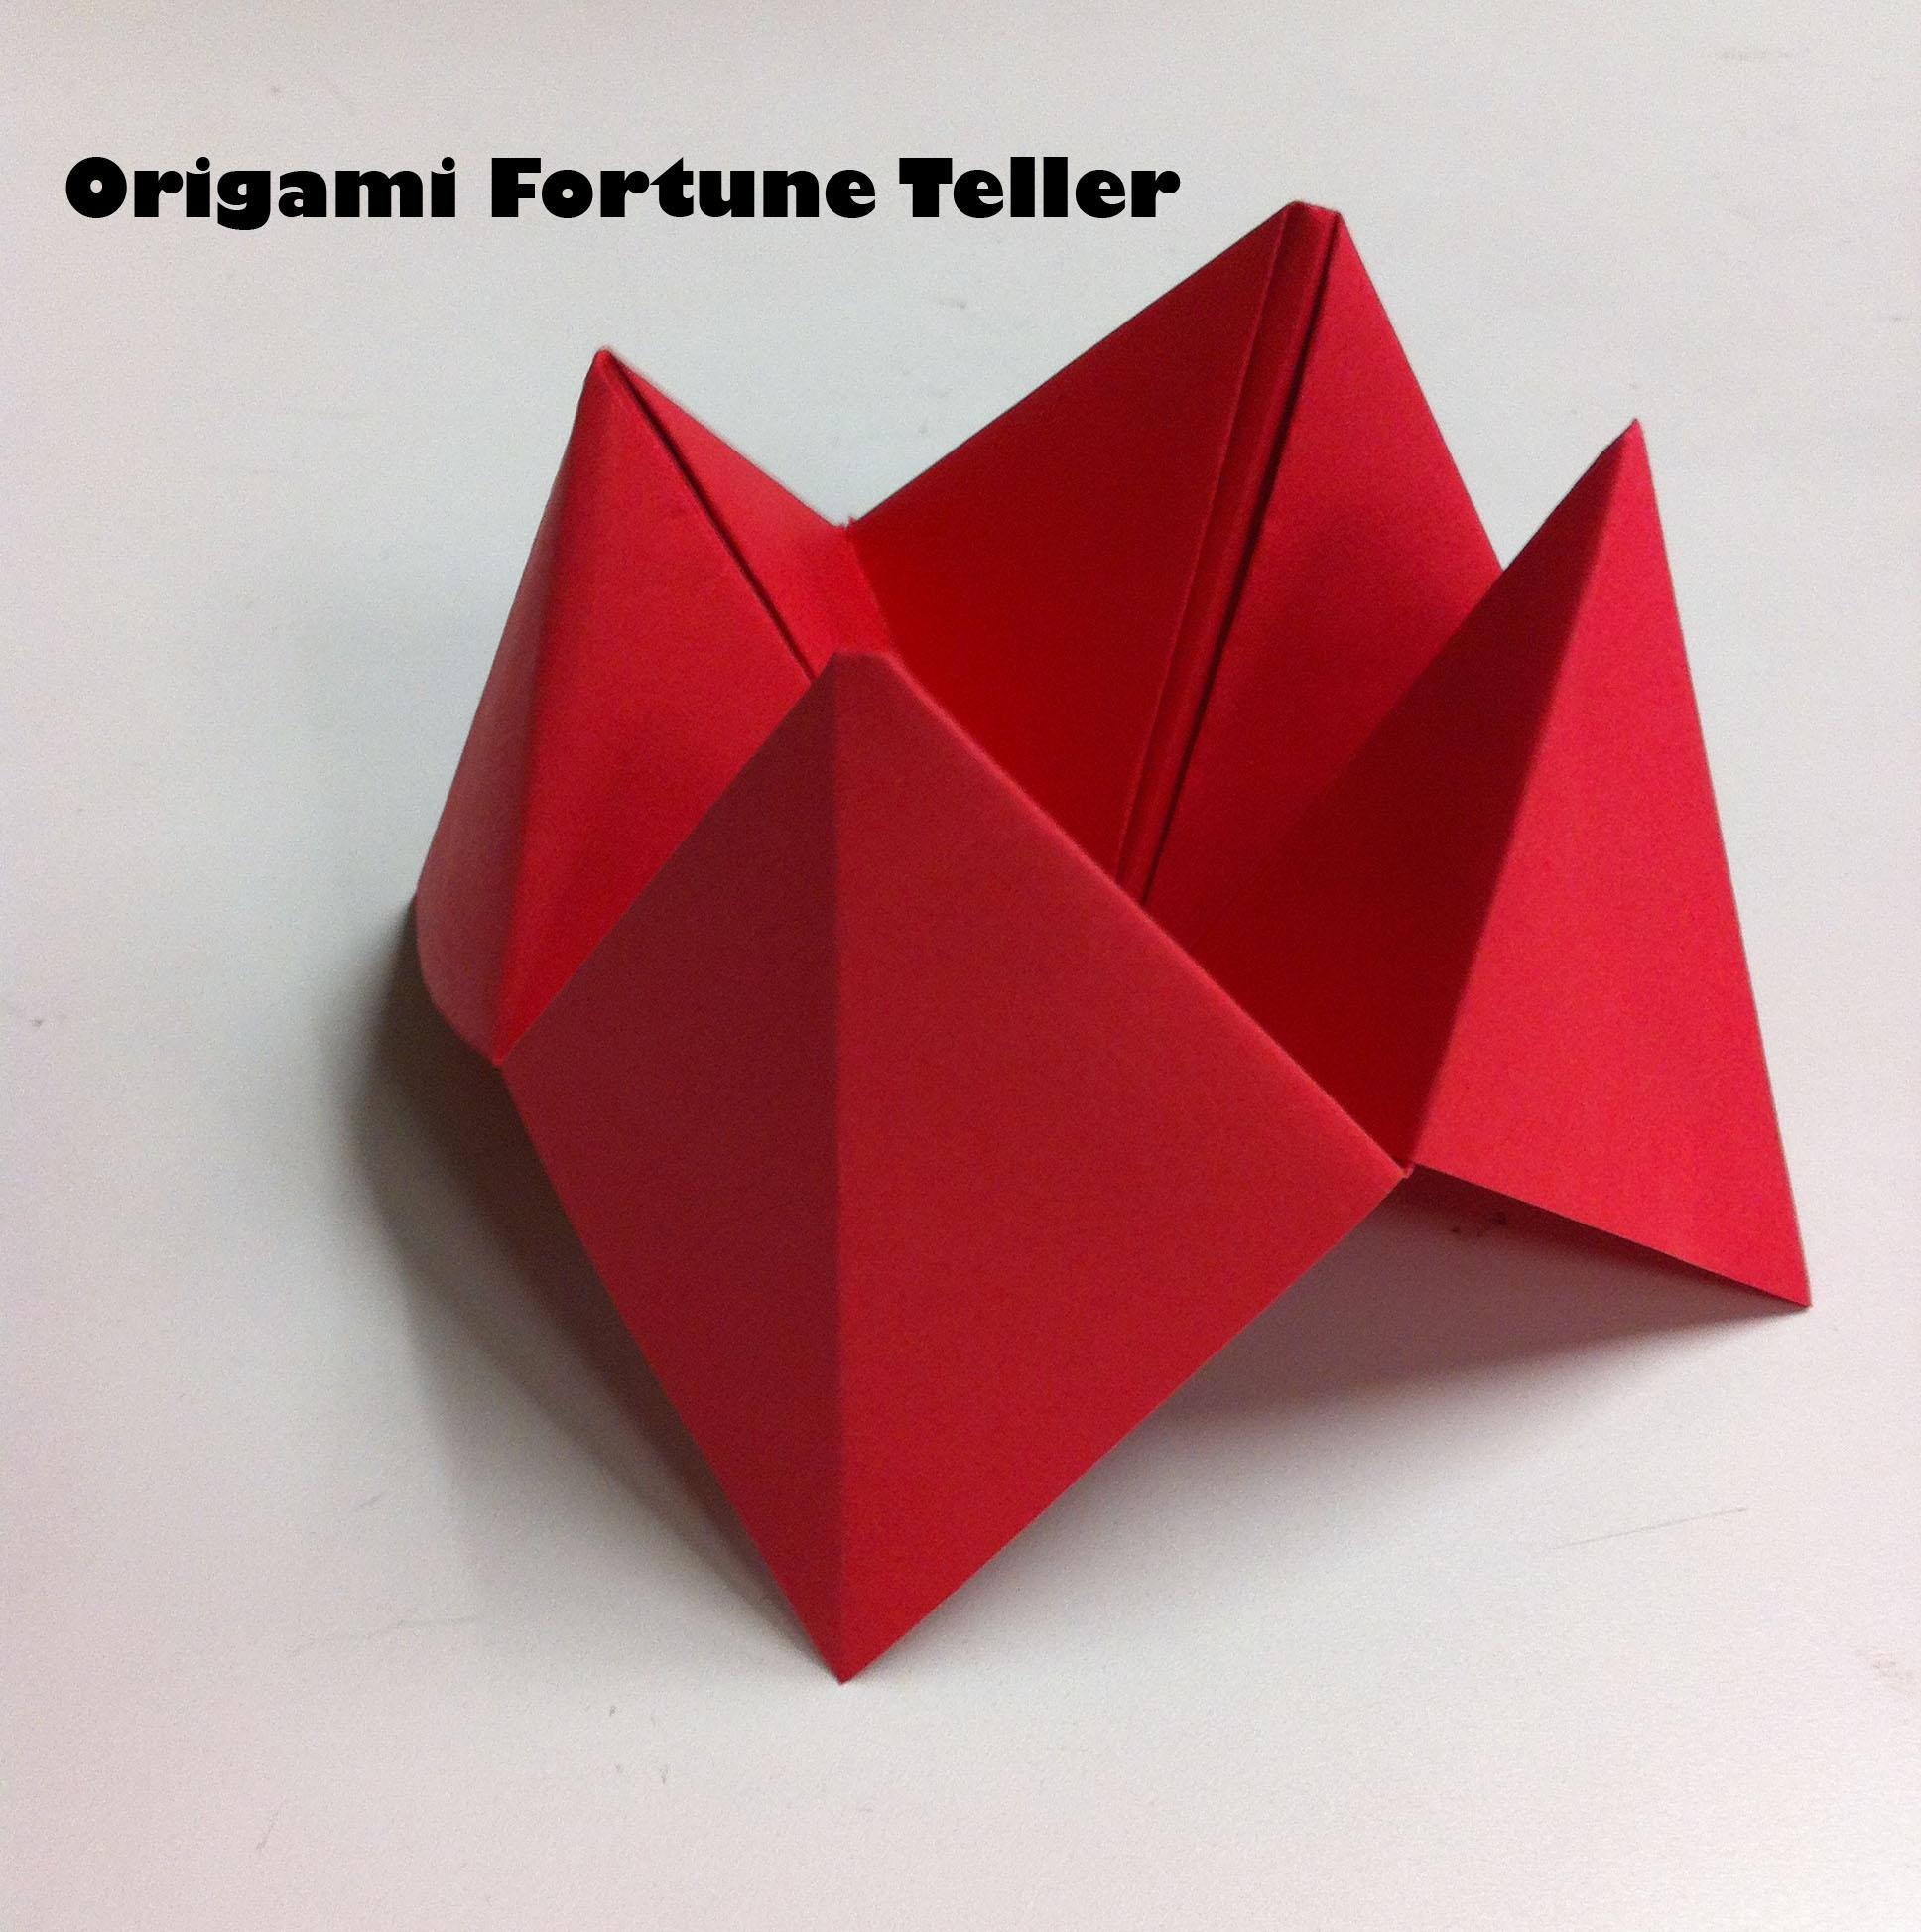 Origami Crafts For Kids Kids Crafts Easy Origami Fortune Teller The Jumpstart Blog